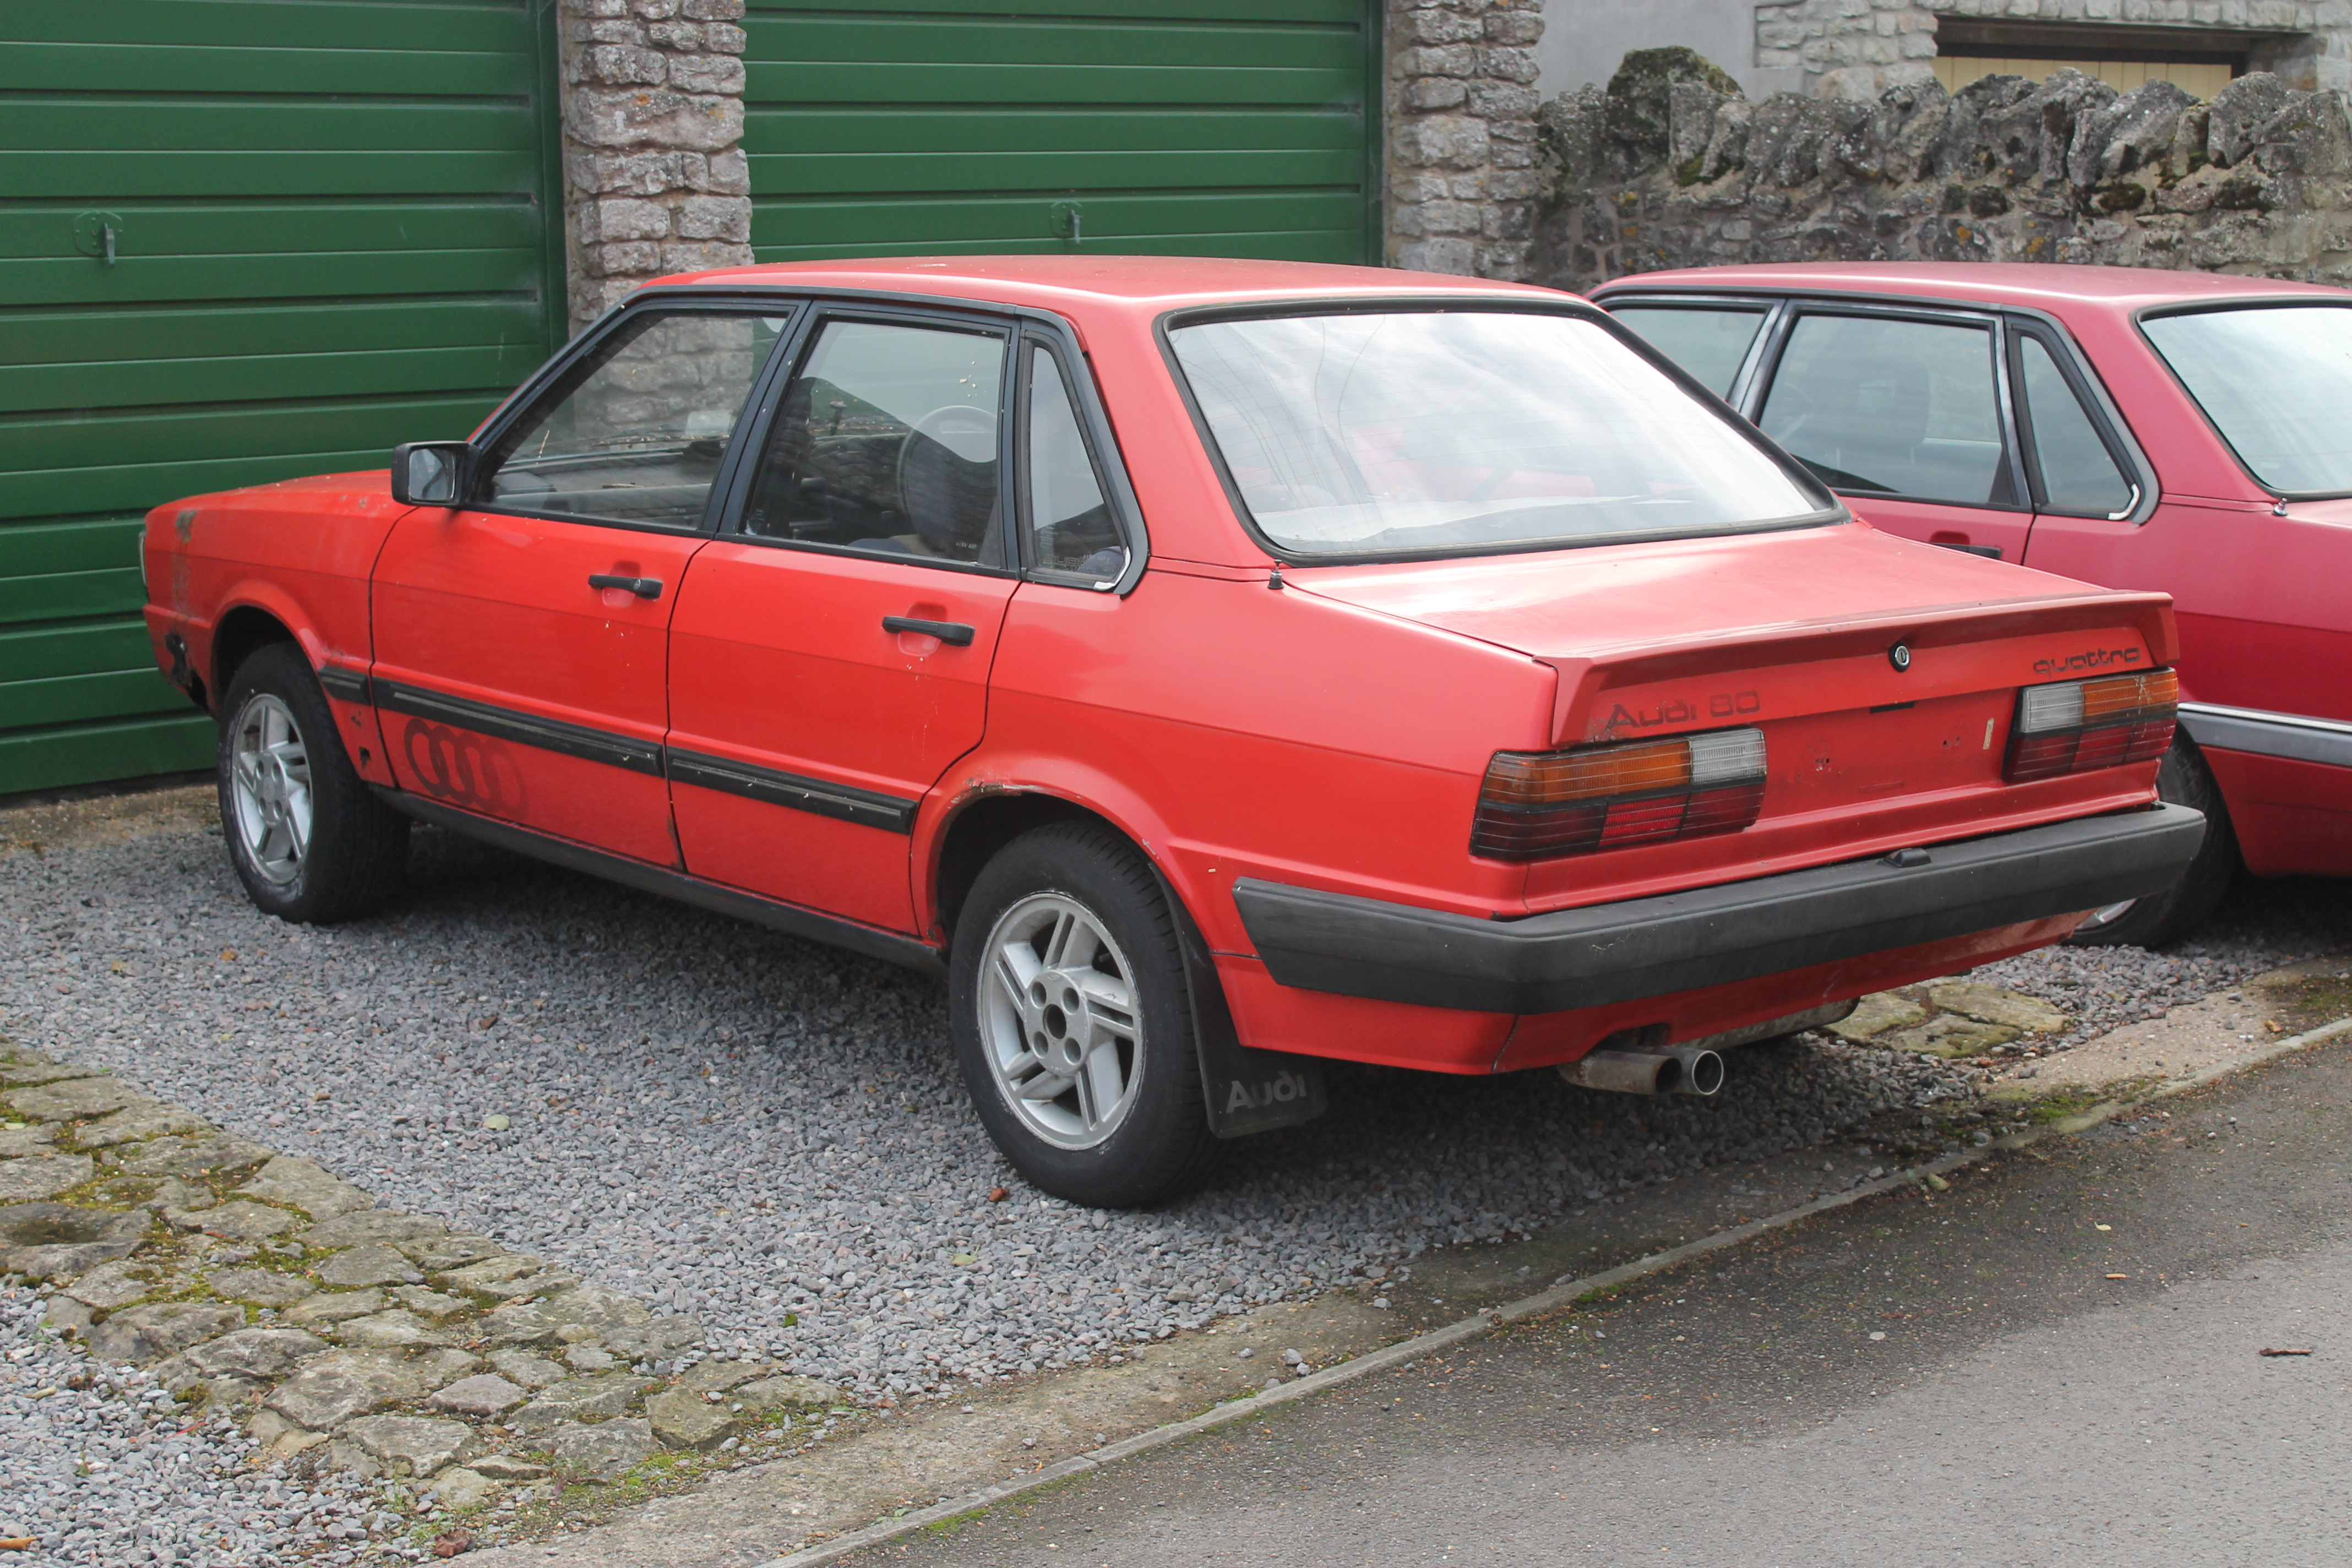 File:1980s Audi 80 Quattro (9983691954).jpg - Wikimedia Commons